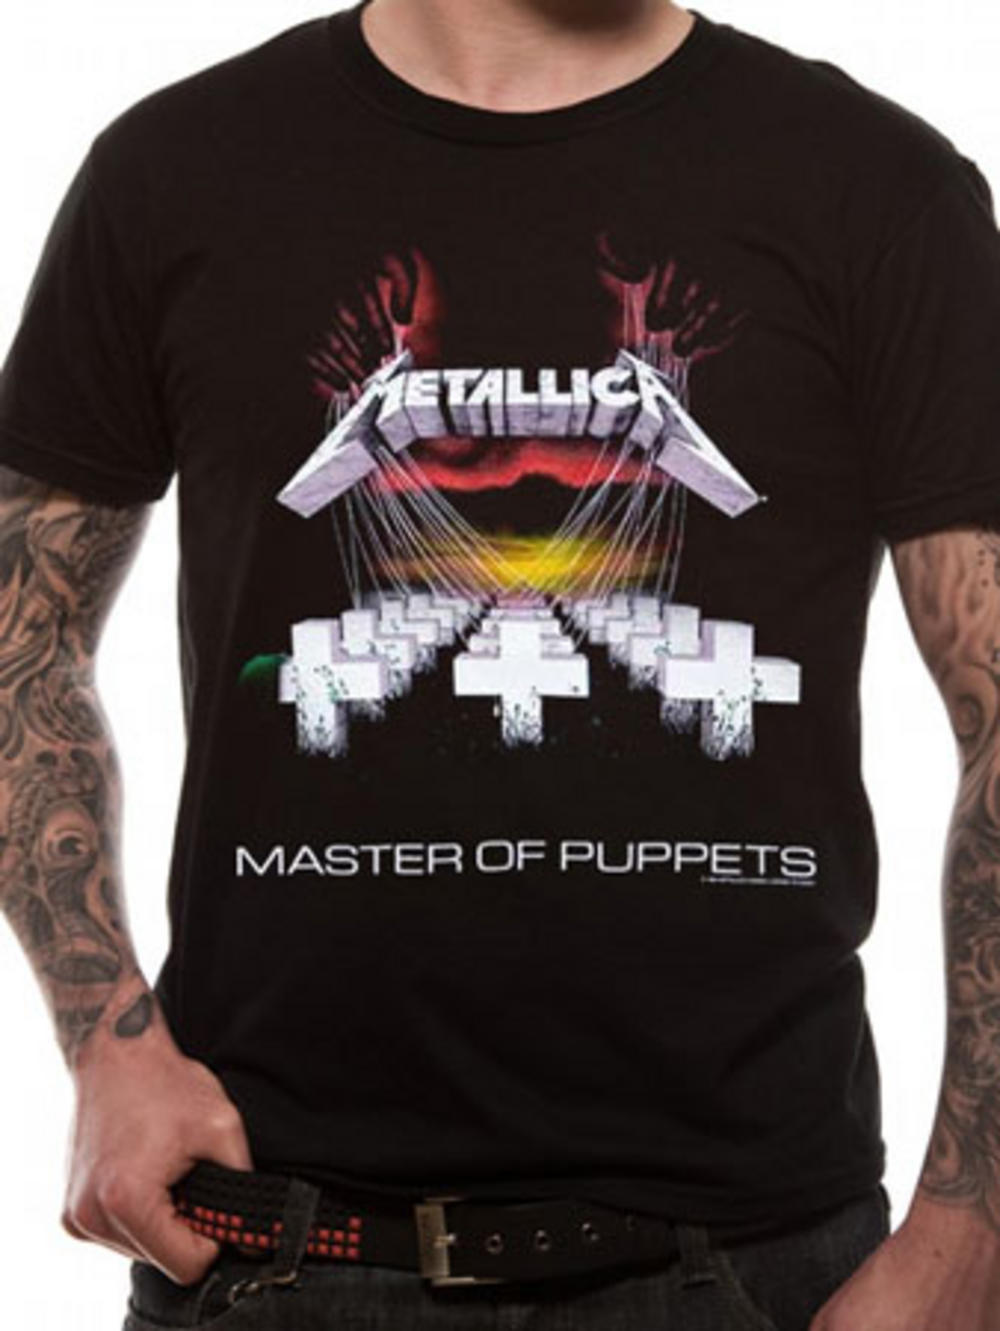 metallica master of puppets t shirt tm shop. Black Bedroom Furniture Sets. Home Design Ideas